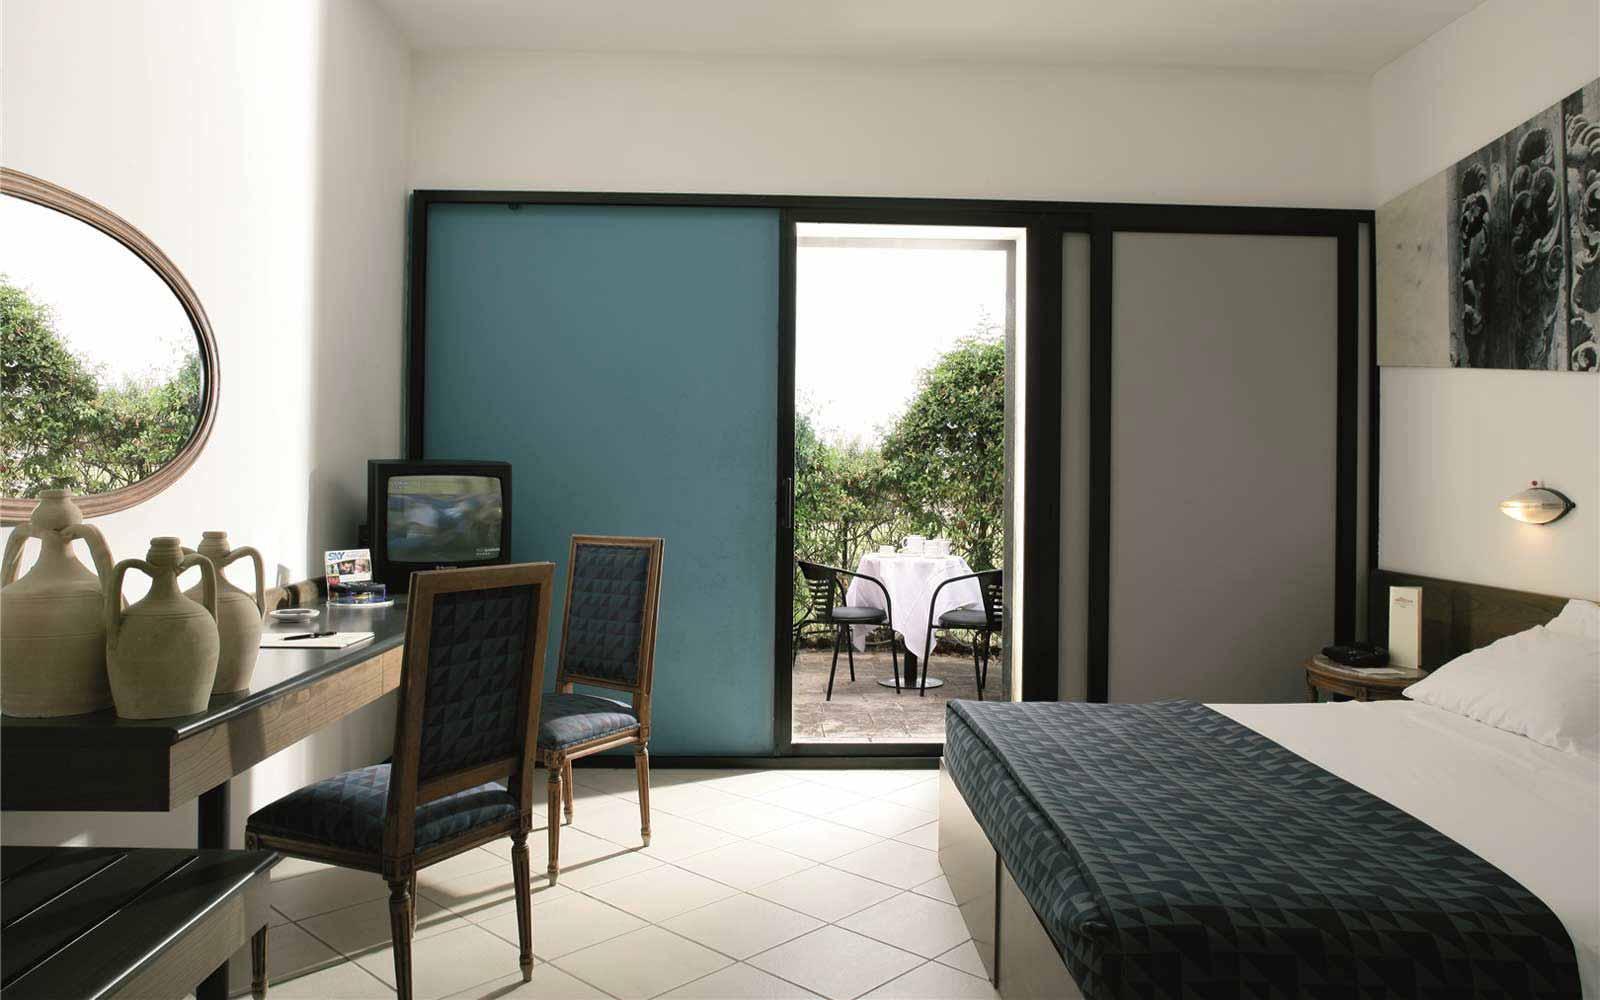 Standard room at the Grand Hotel Masseria Santa Lucia